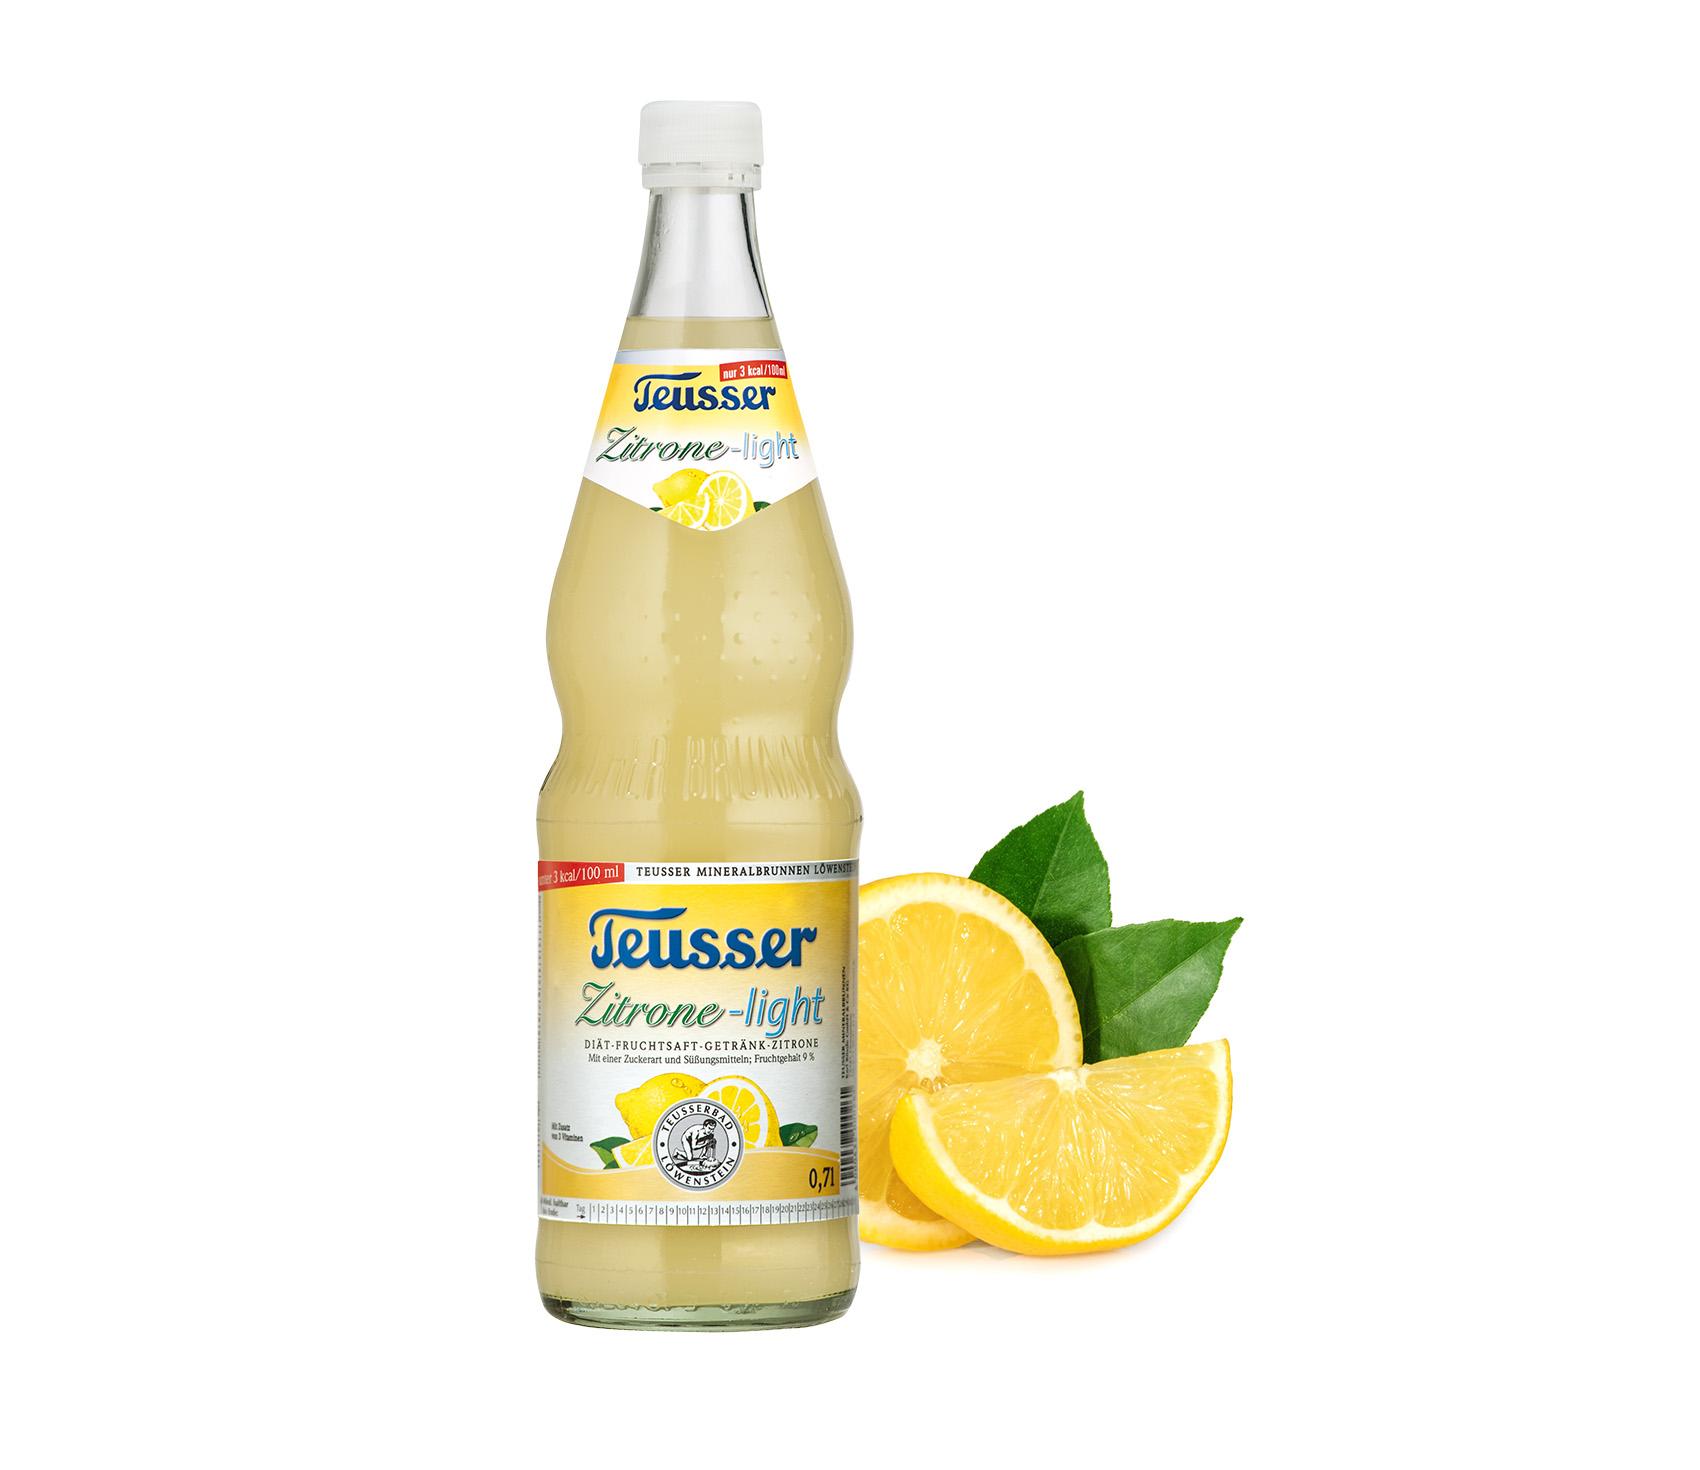 Zitrone-light